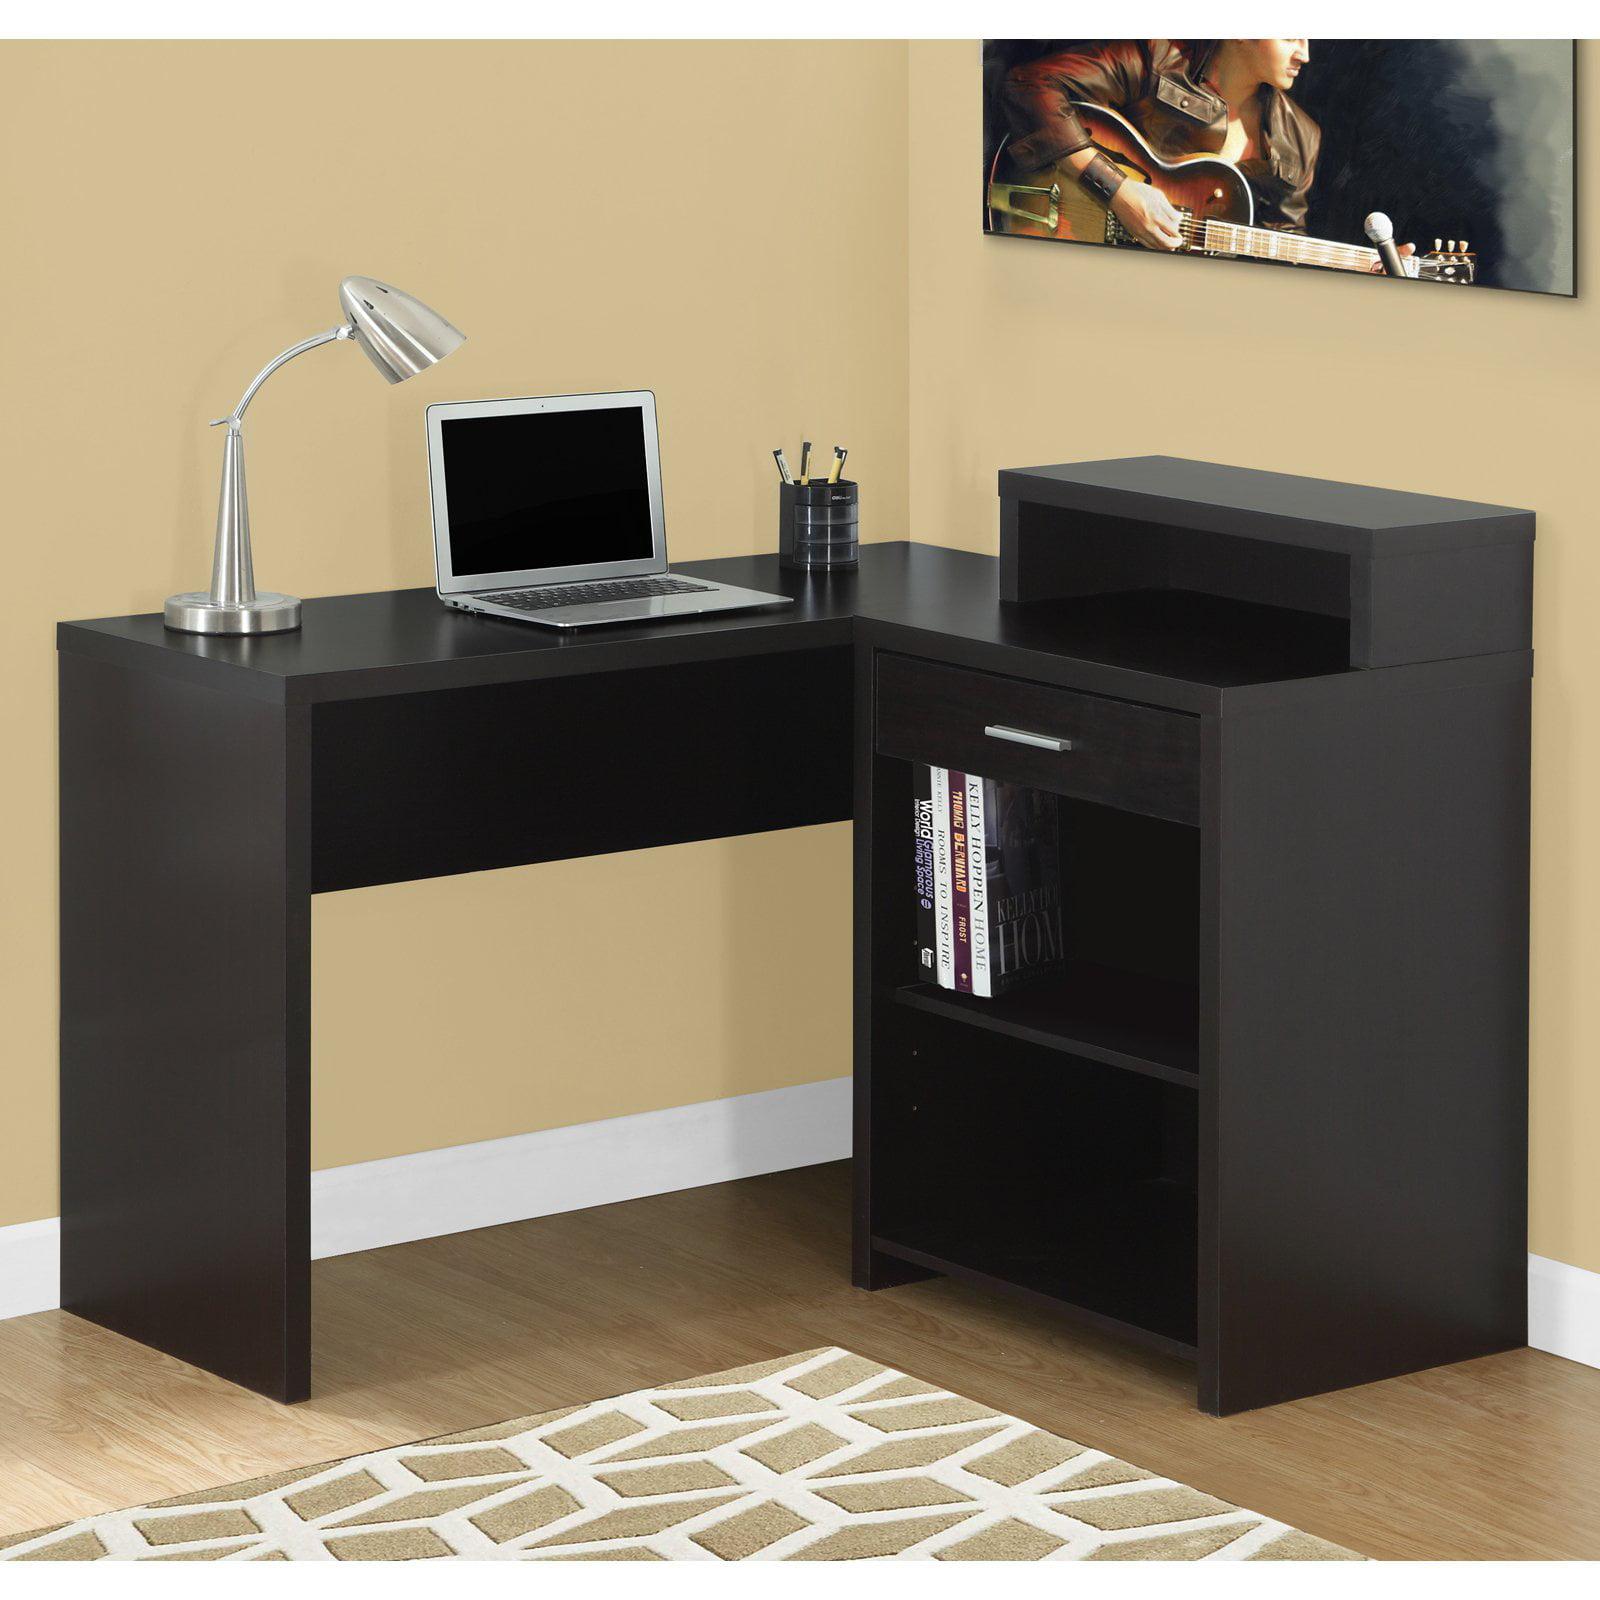 Home office desk ottawa - Home Office Desk Ottawa 59